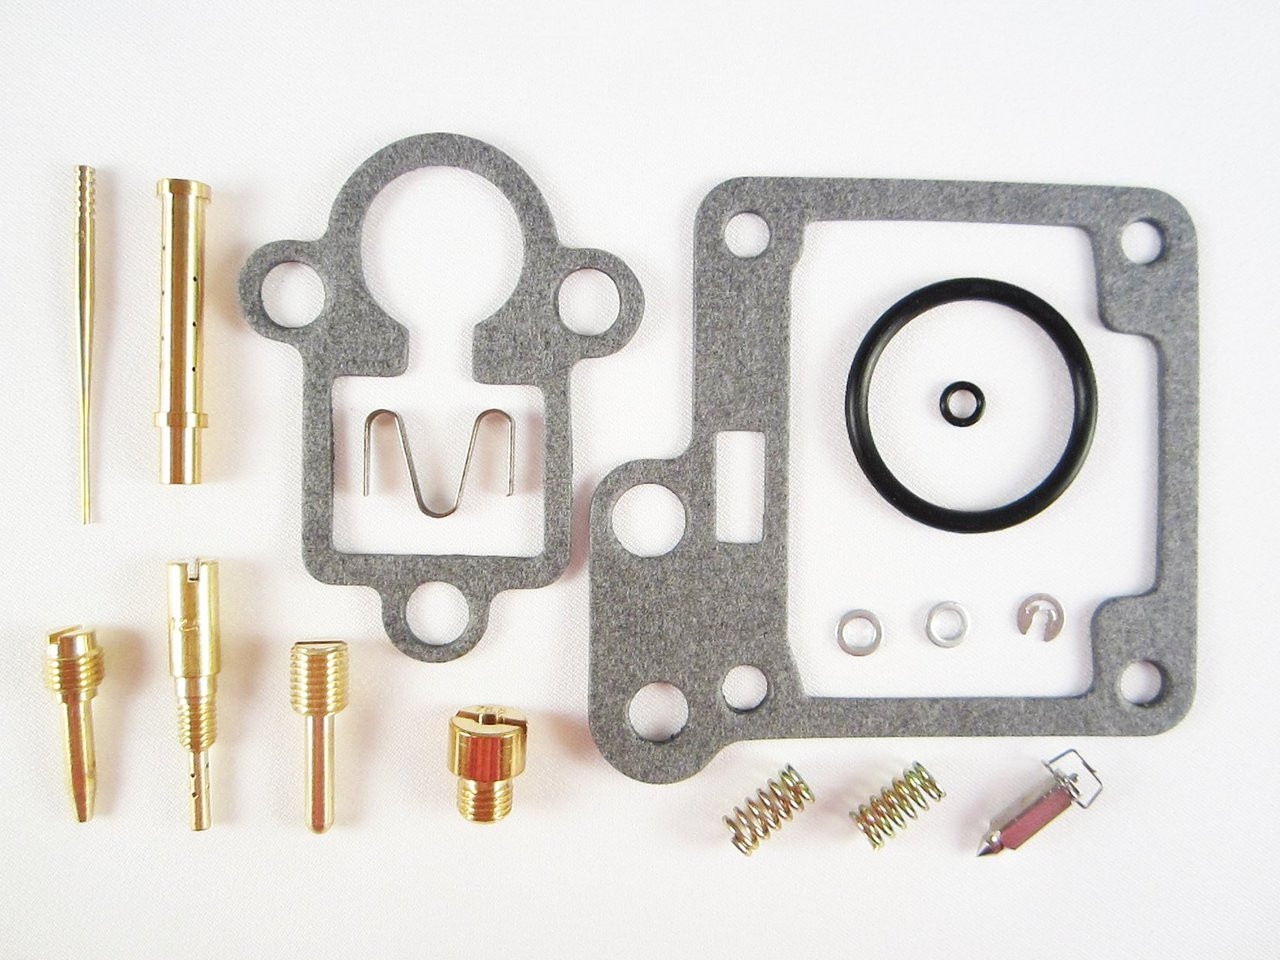 Carburetor Rebuild Kit for 1992-2004 Yamaha Badger 80 YFM80 ATV